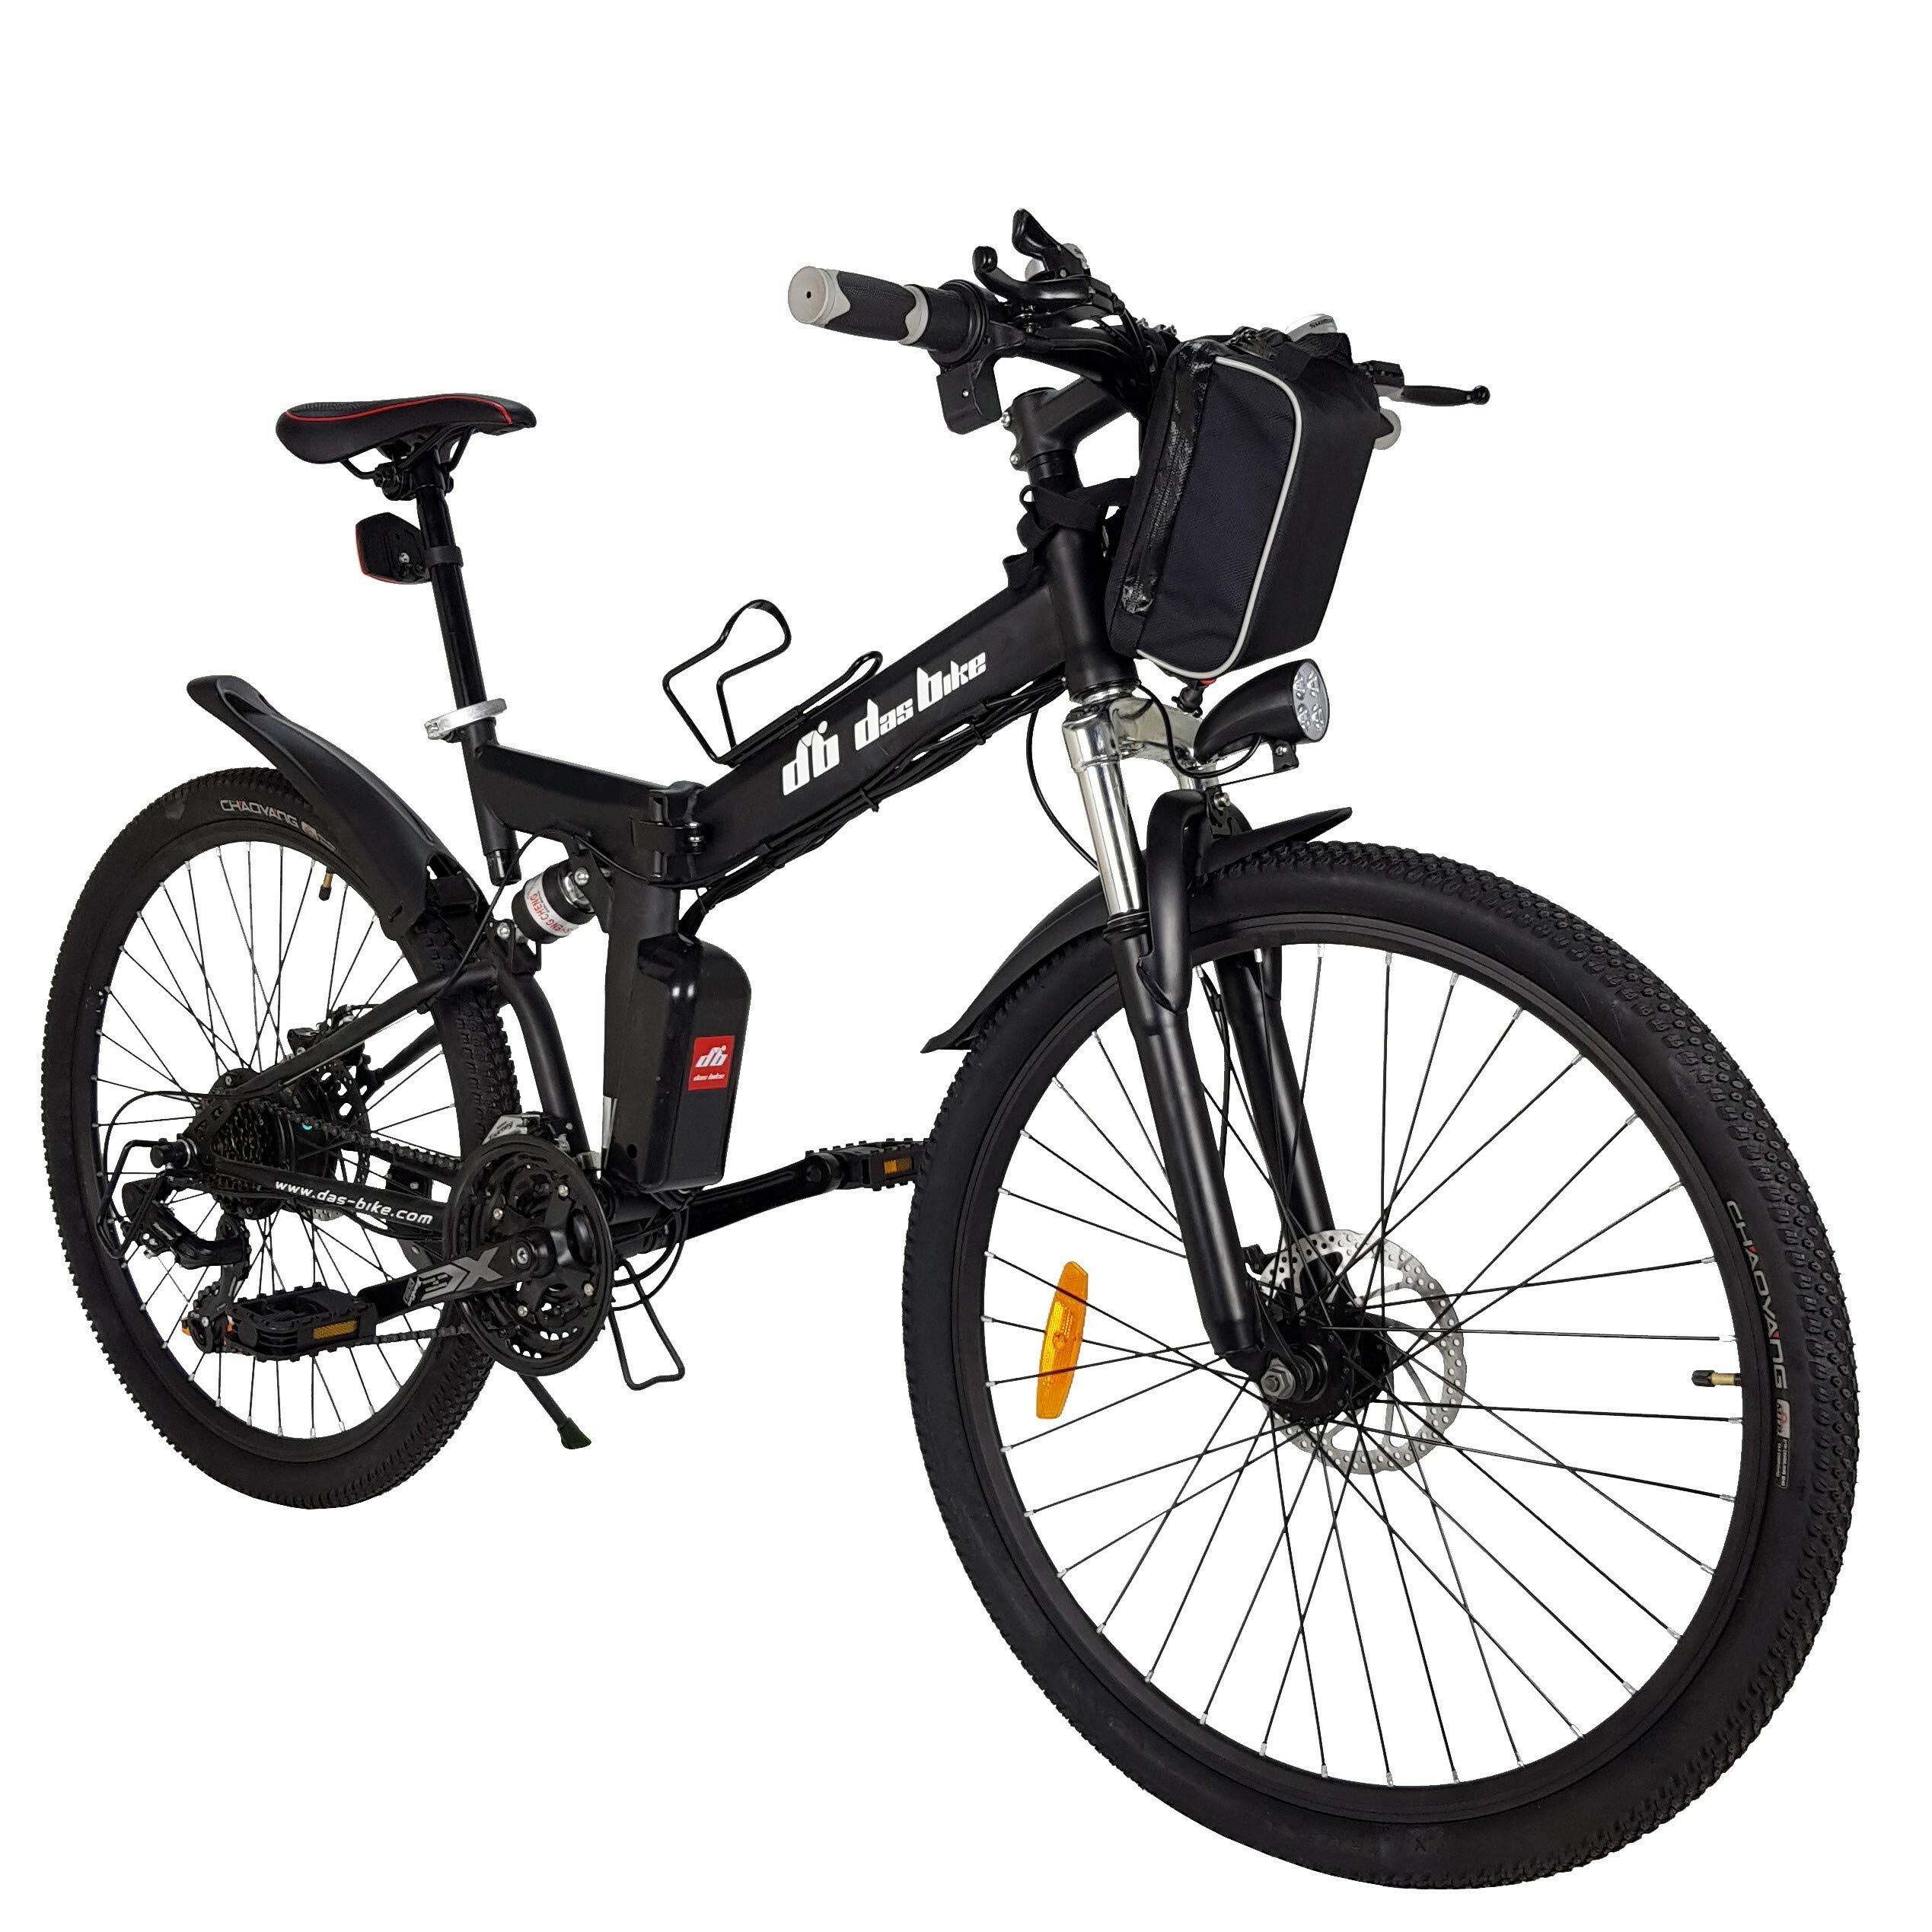 Radsport 26 EBike Elektro Fahrrad Faltrad Ebike 21 Speed Shimano Pedelec Mountainbike